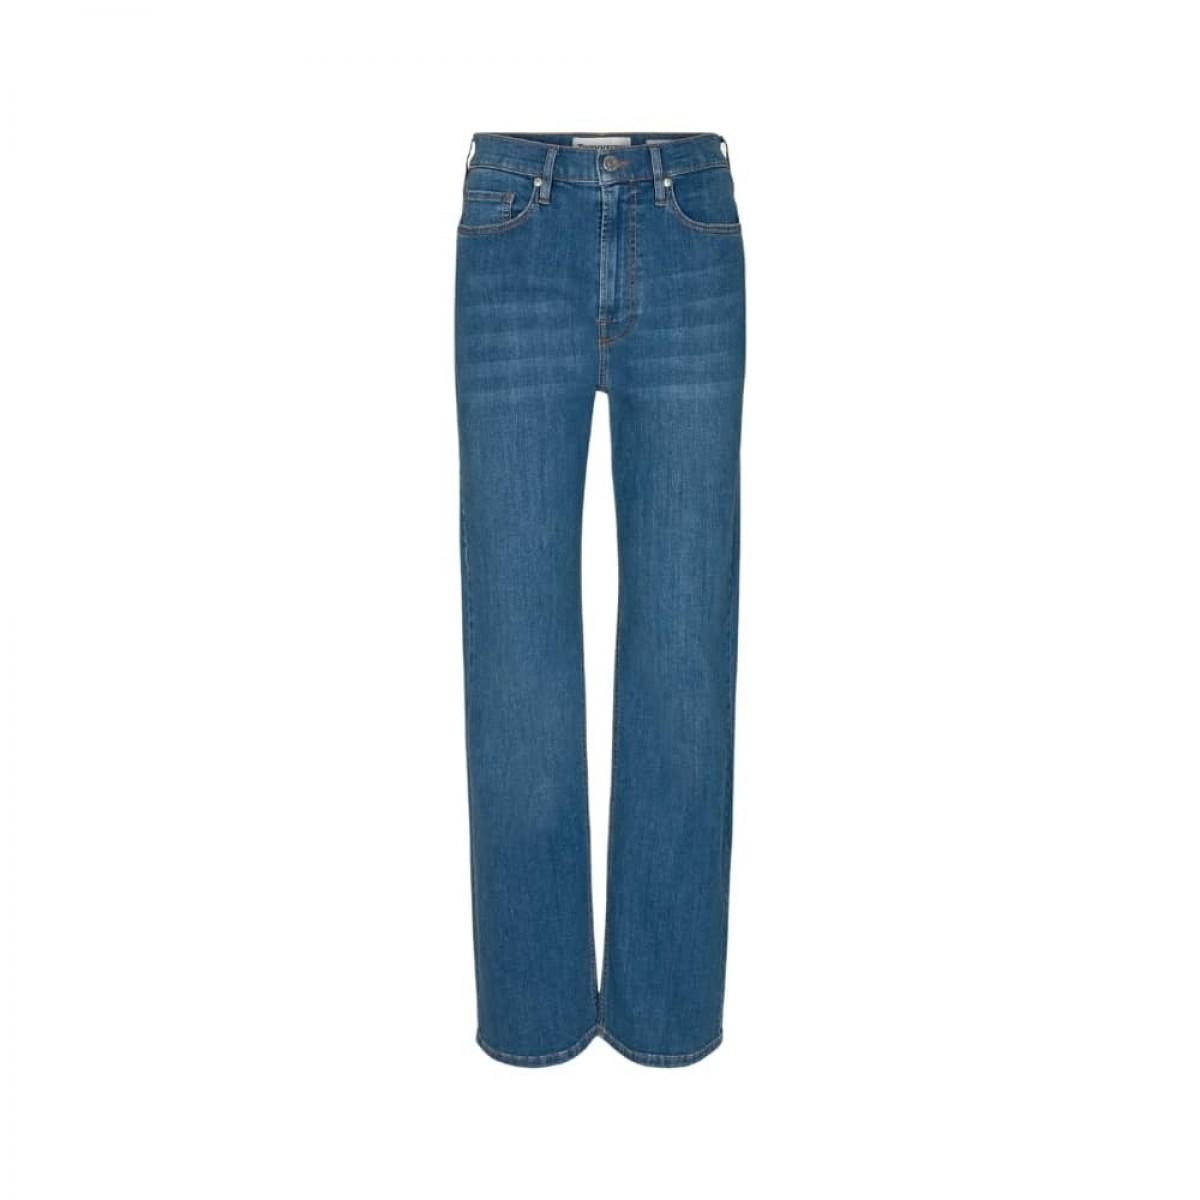 brown straight jeans - denim blue - front